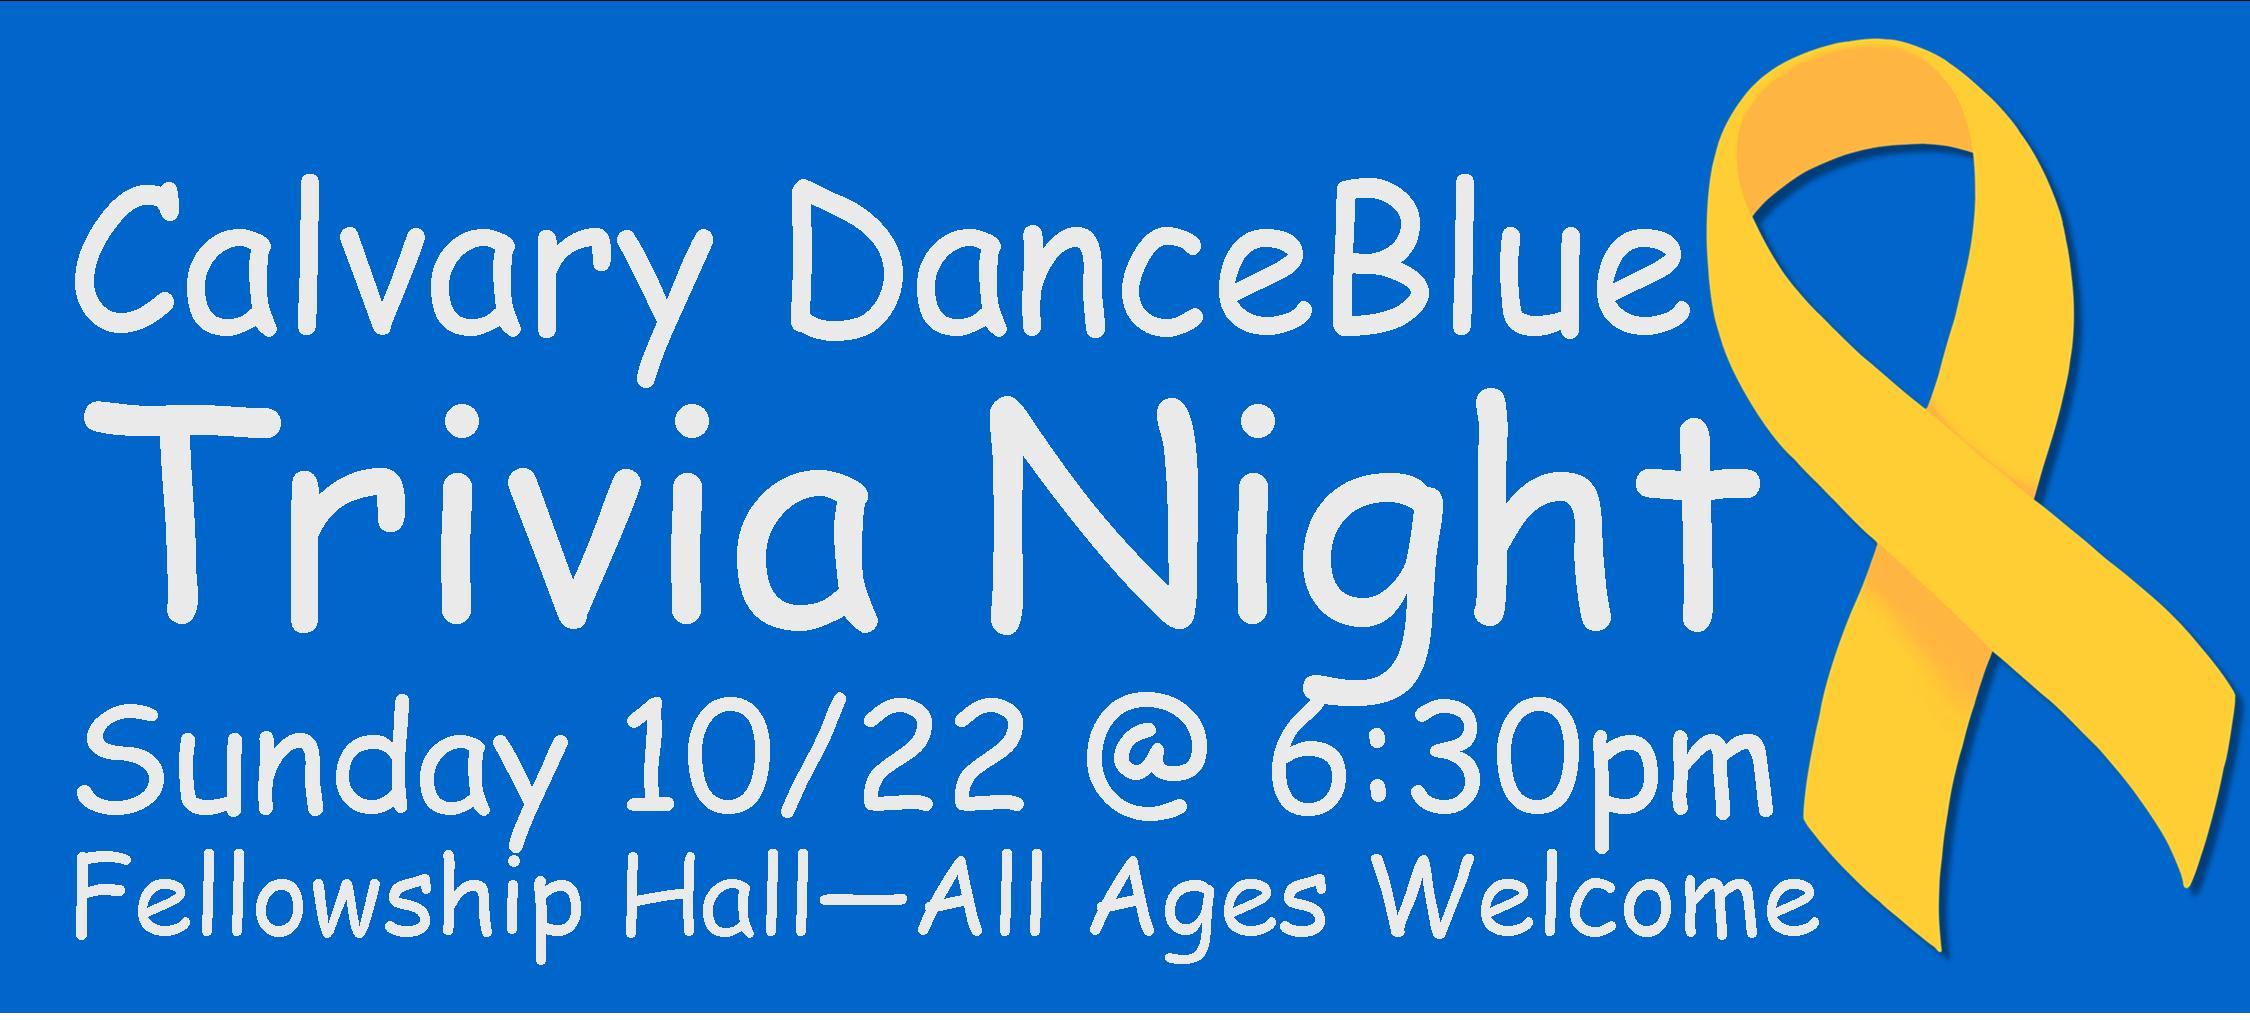 DanceBlue Trivia Night 101117.jpg